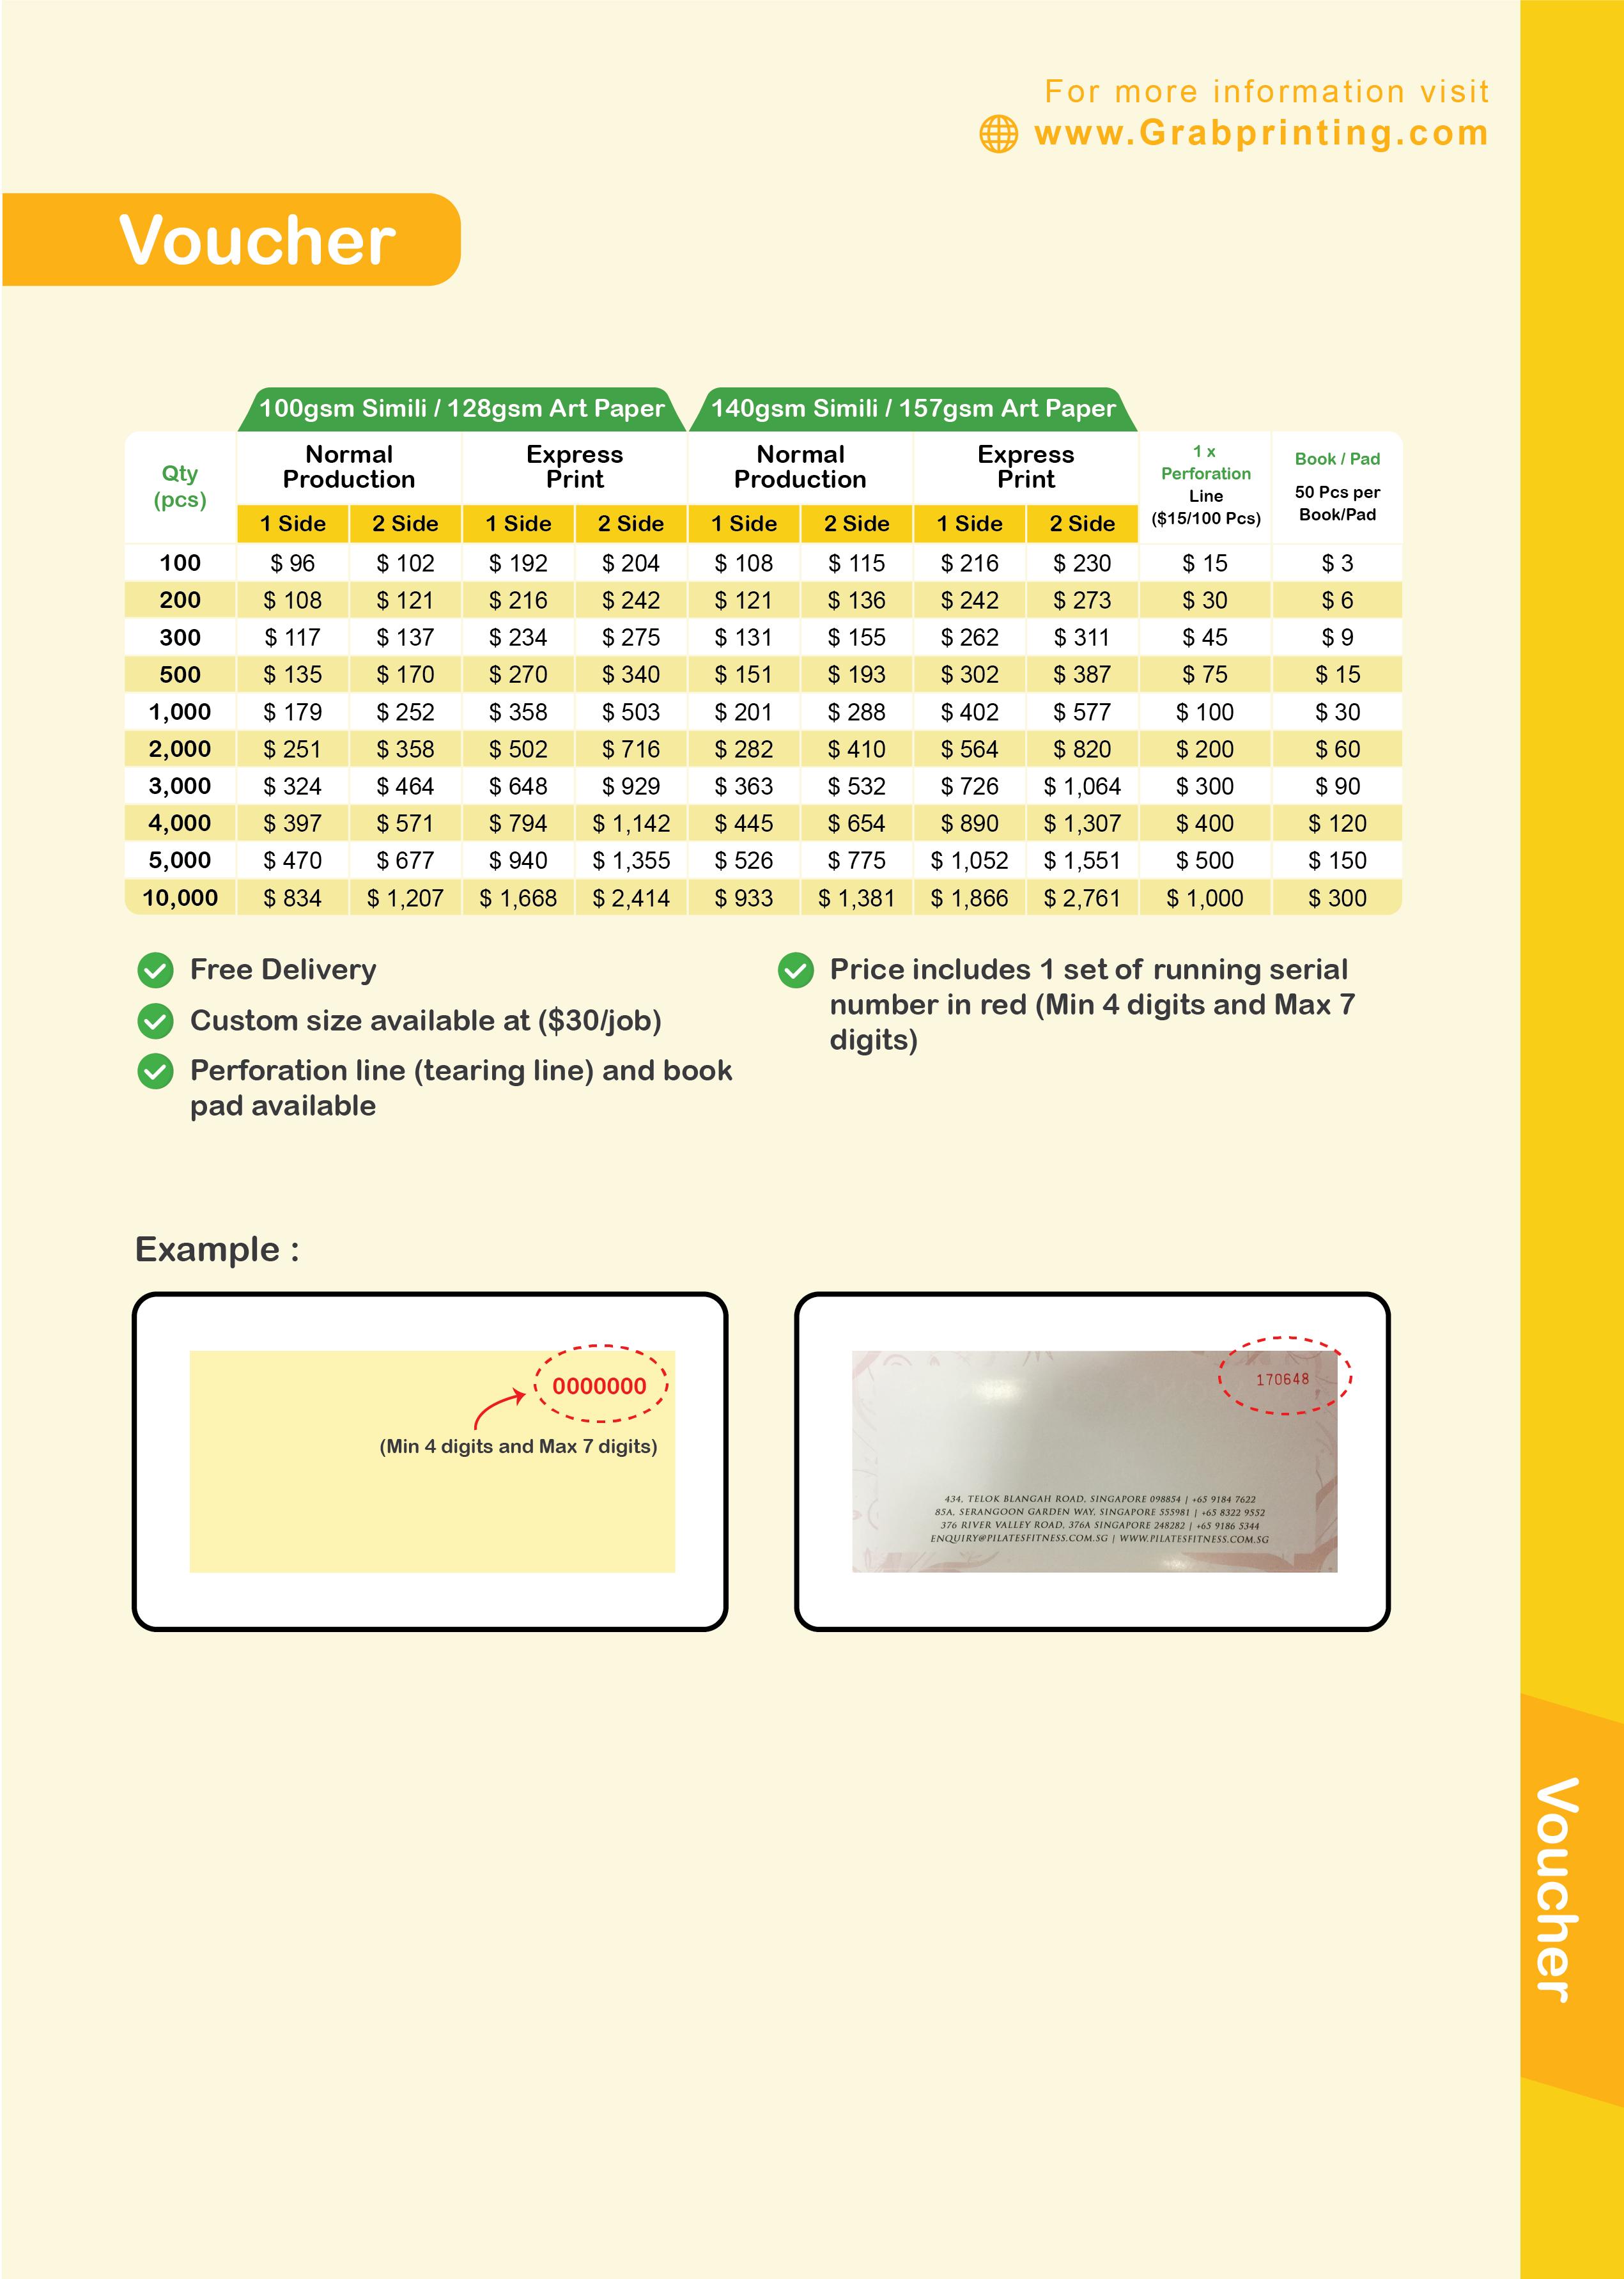 Voucher Printing Voucher Printing Price List